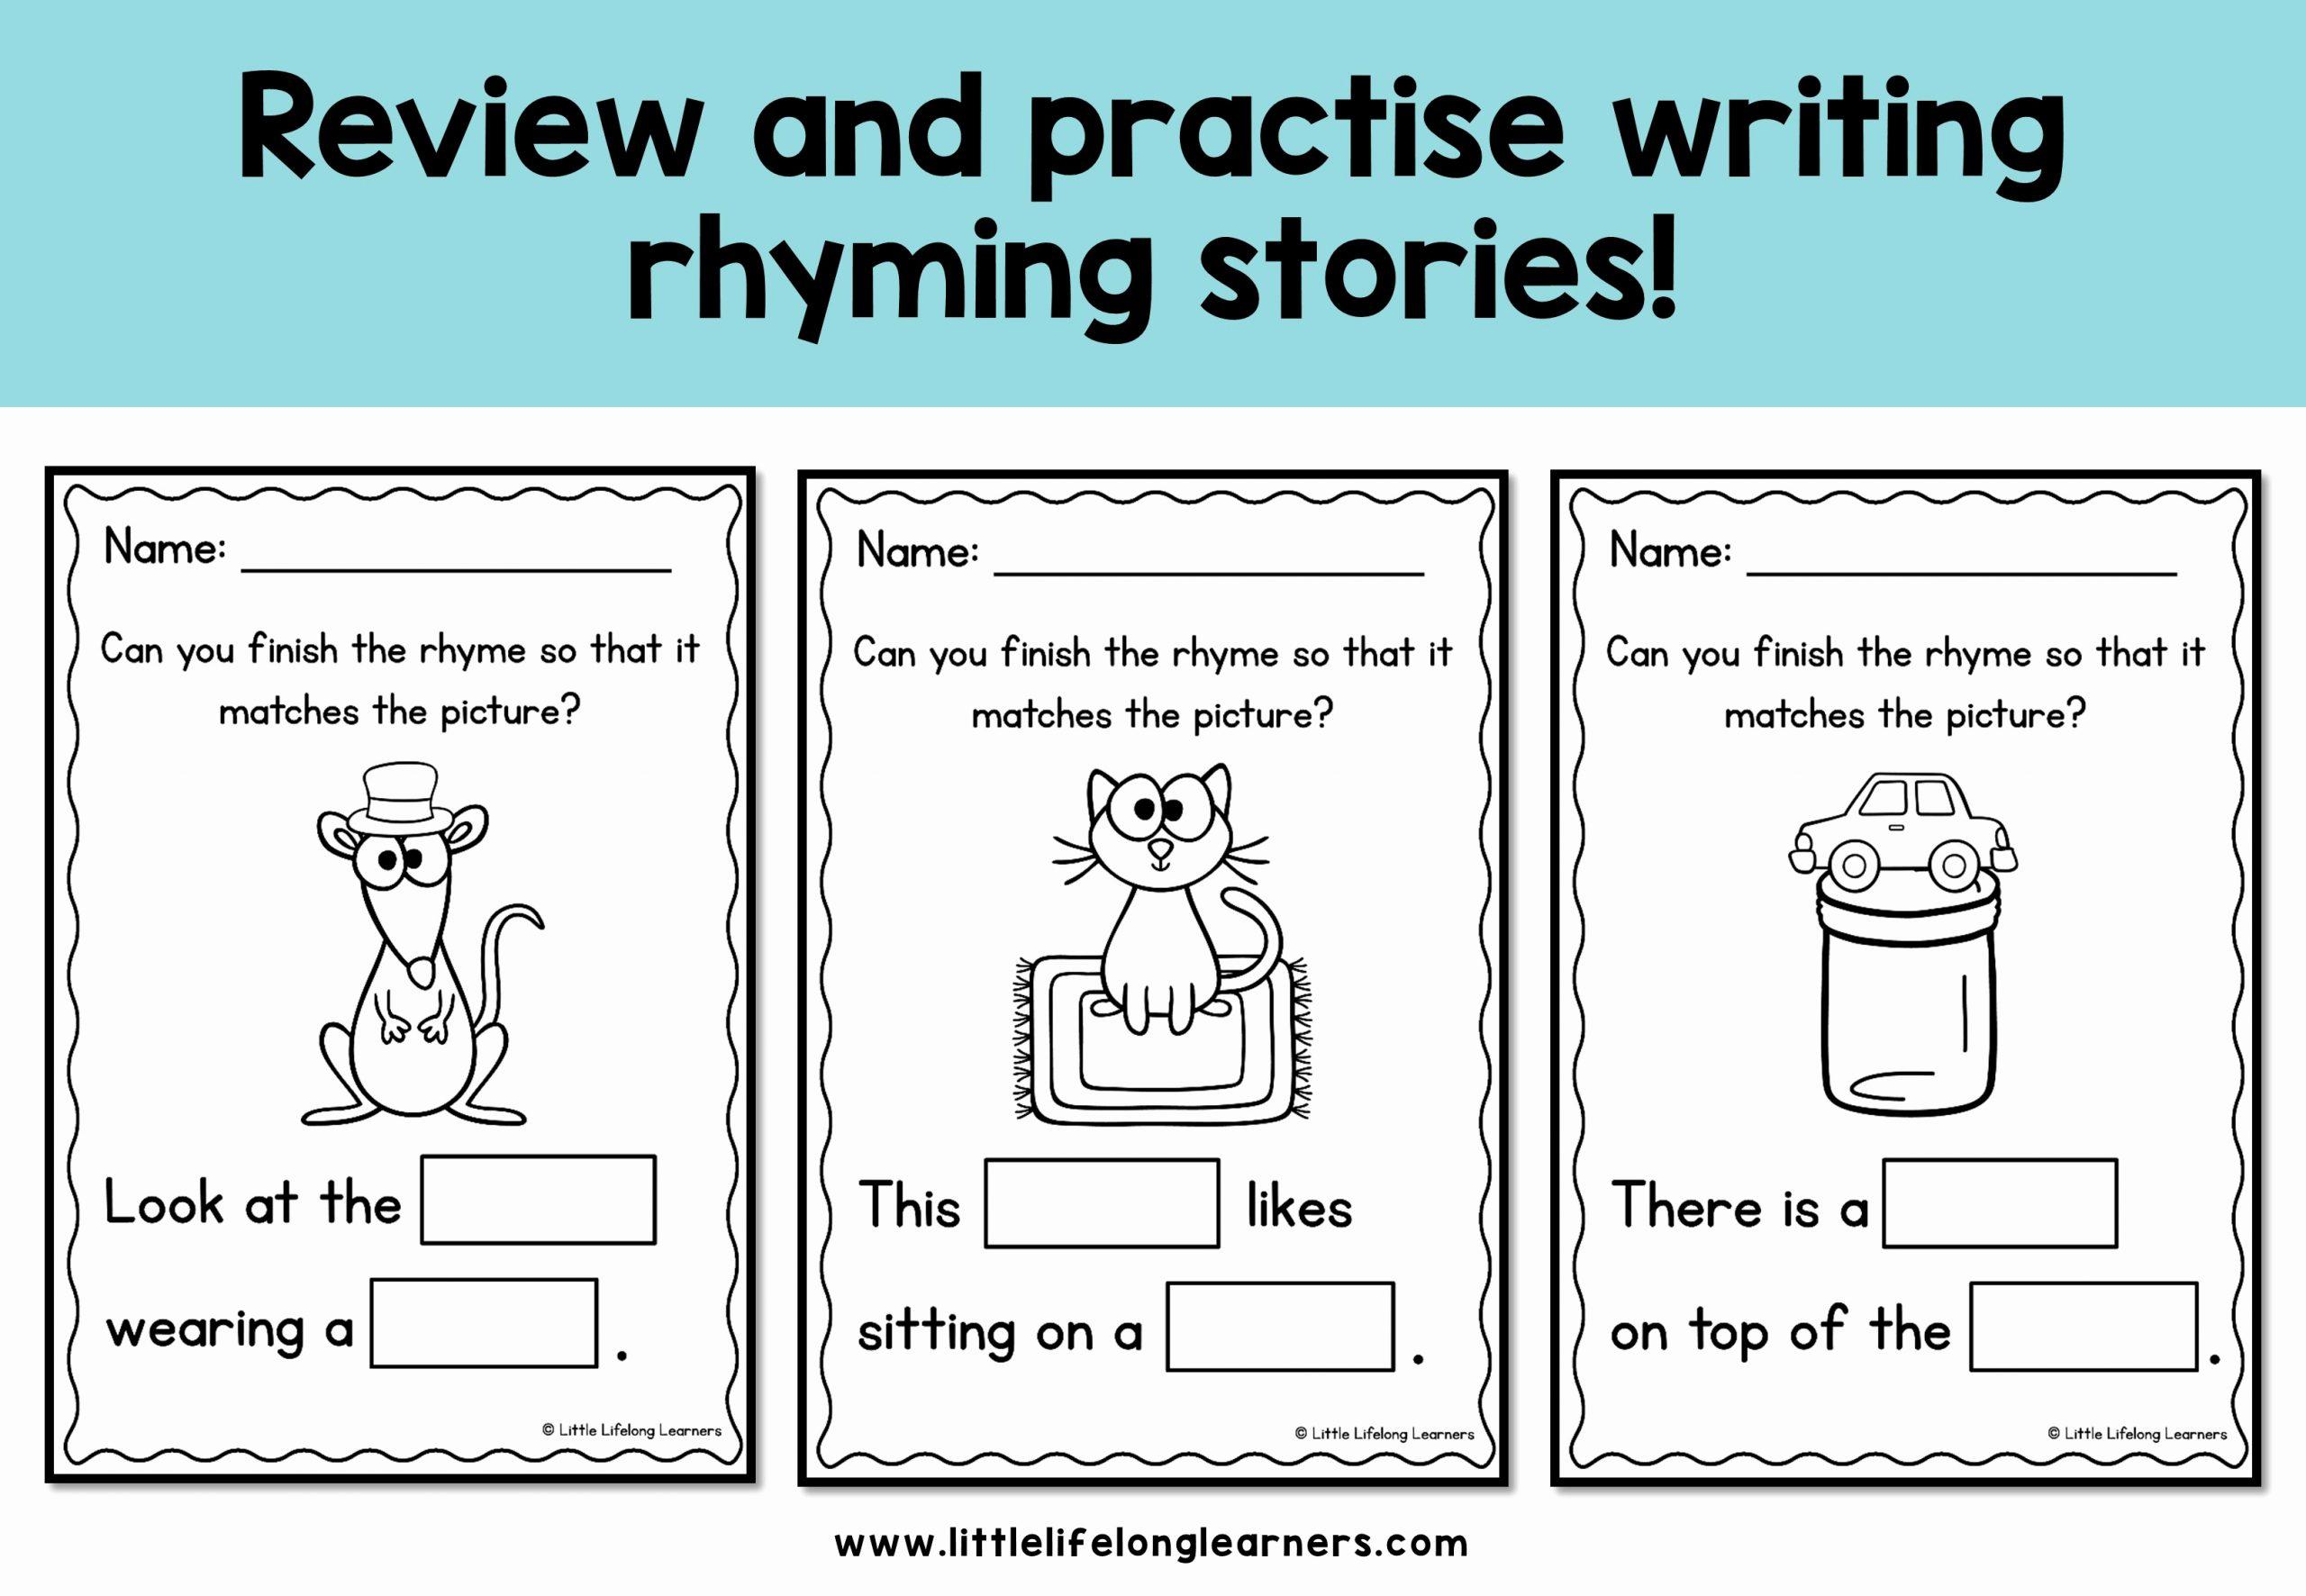 Rhyming Worksheets for Preschool Awesome Rhyming Stories Plete the Rhyme Little Lifelong